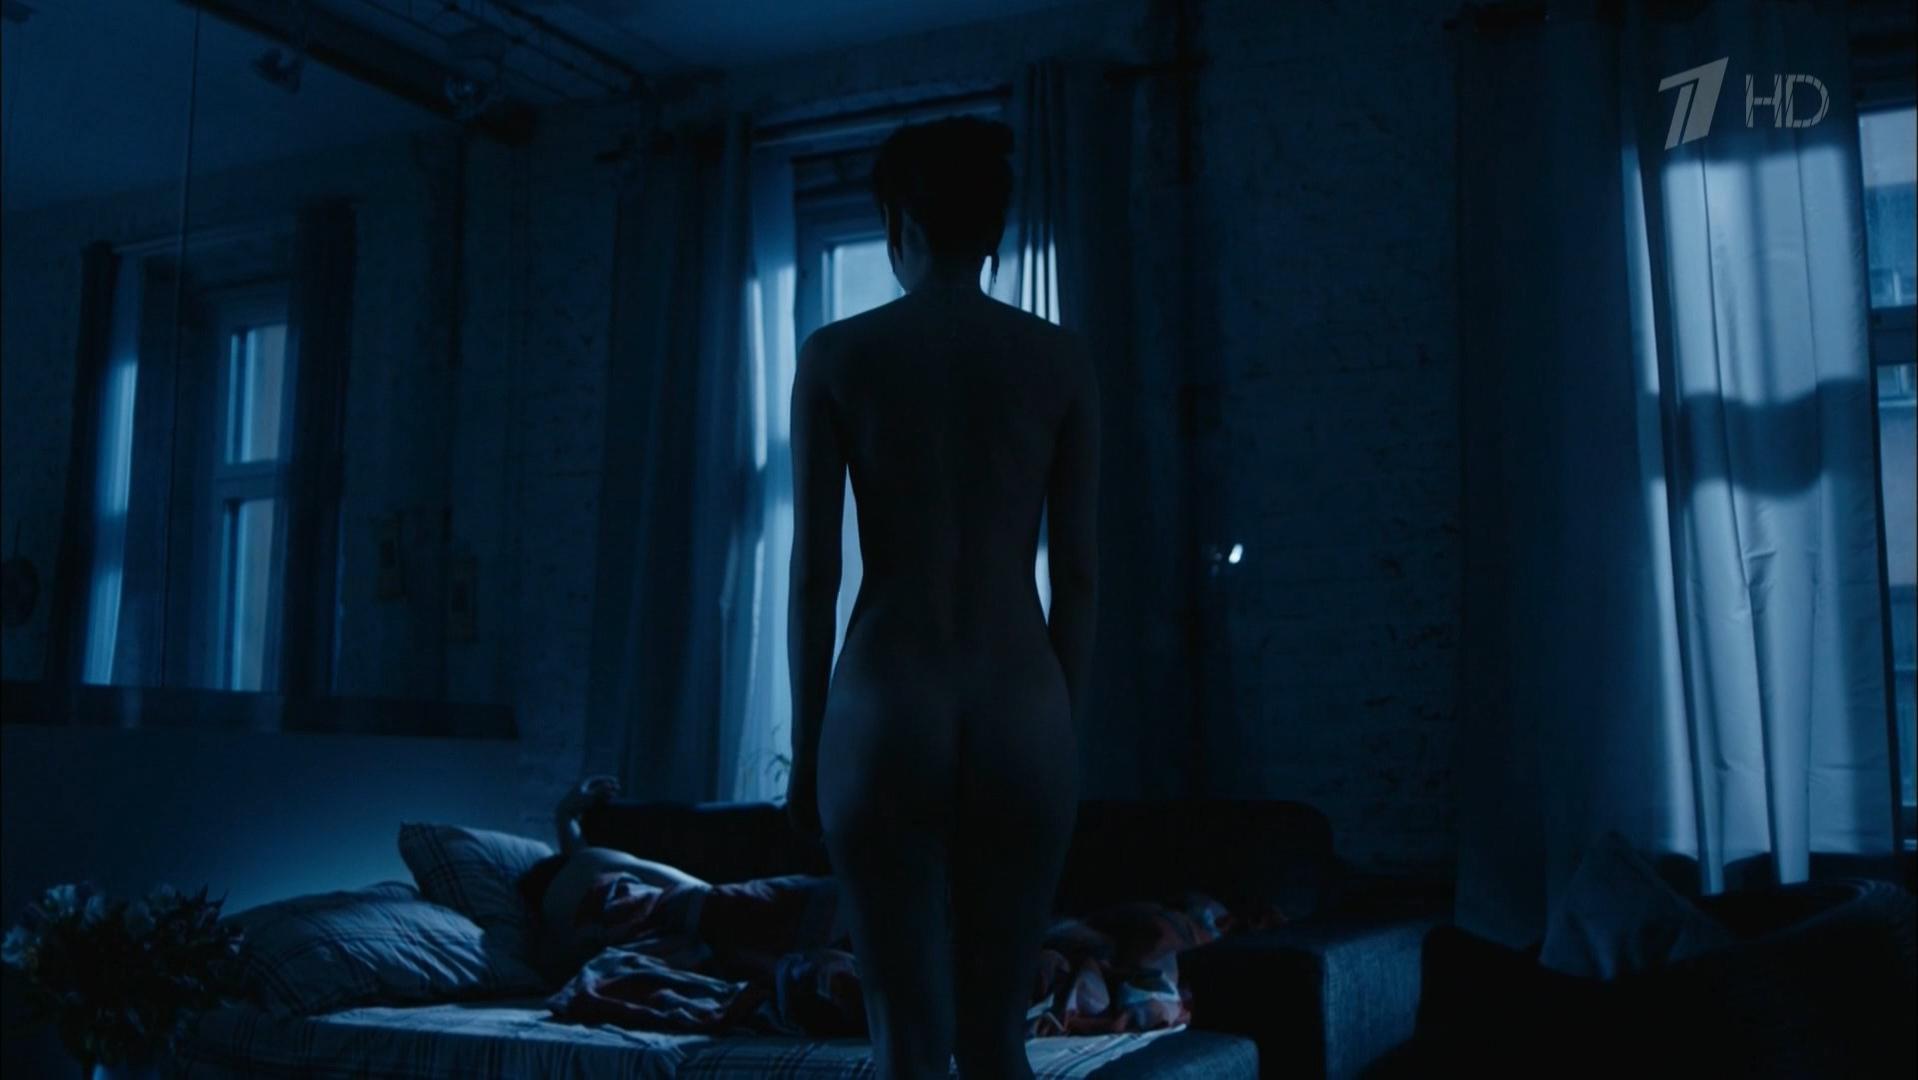 Marina Konyashkina nude - Luchshe ne byvaet s01e09 (2015)